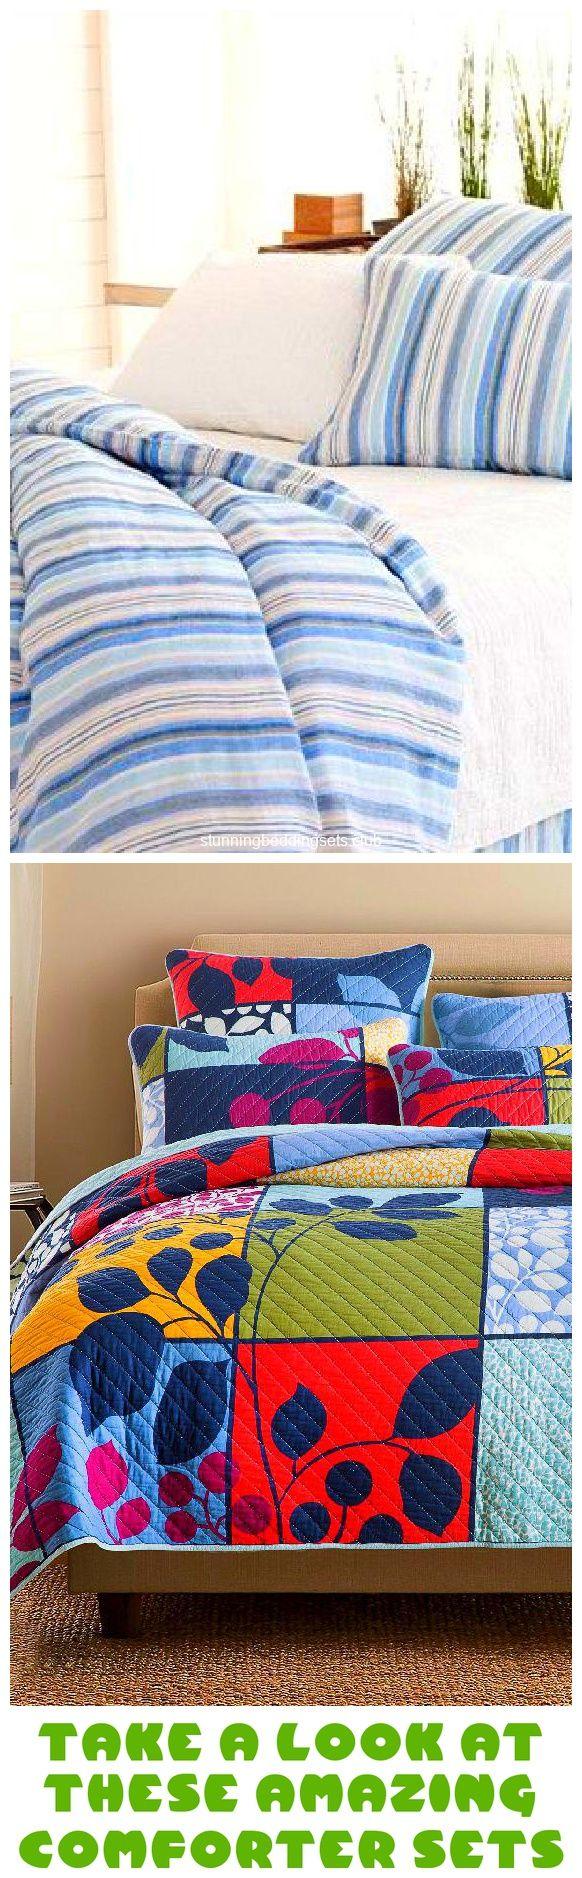 10 Cool Bed Linen Decorations Item 6505362707 Comforterset